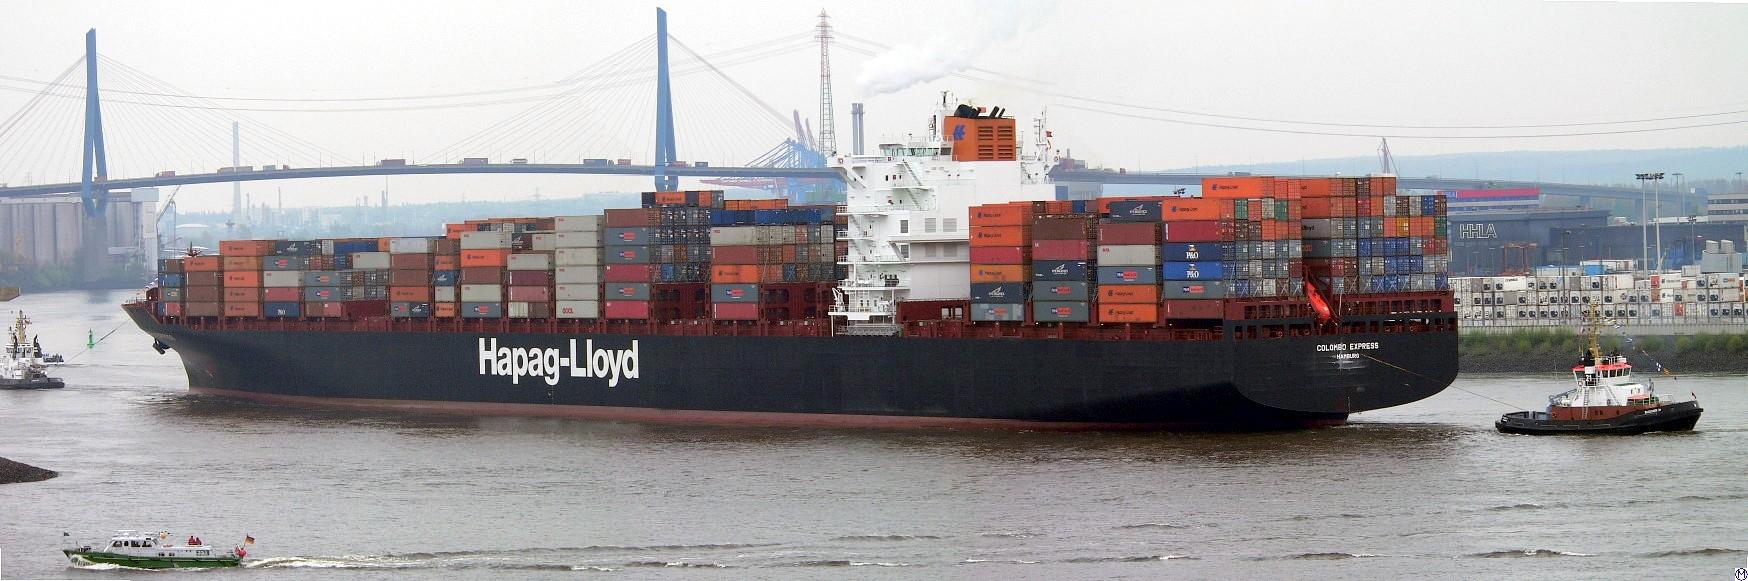 hight resolution of cargo ship wikipediafreight ship diagram 19